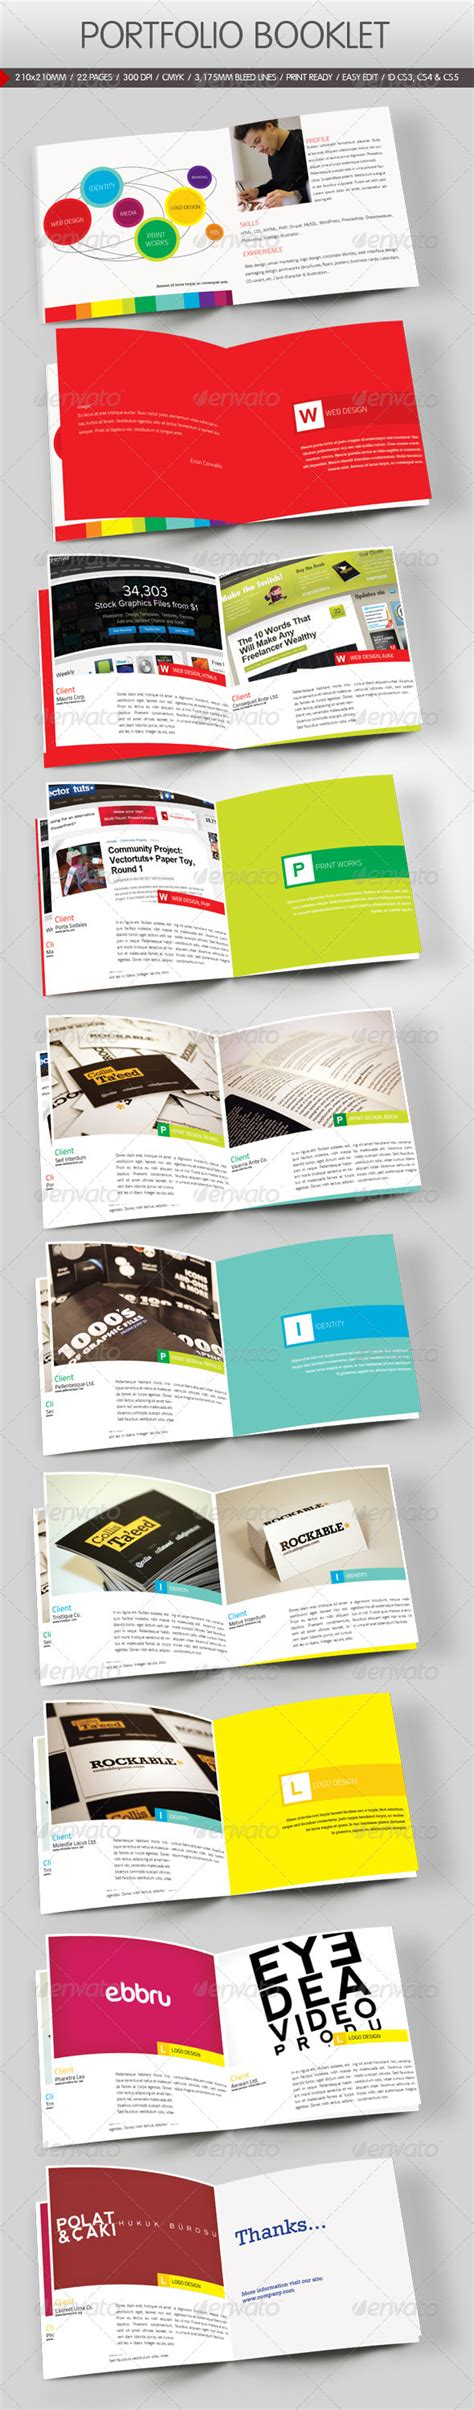 portfolio print template a5 brochure booklet template minimal portfolio 187 dondrup